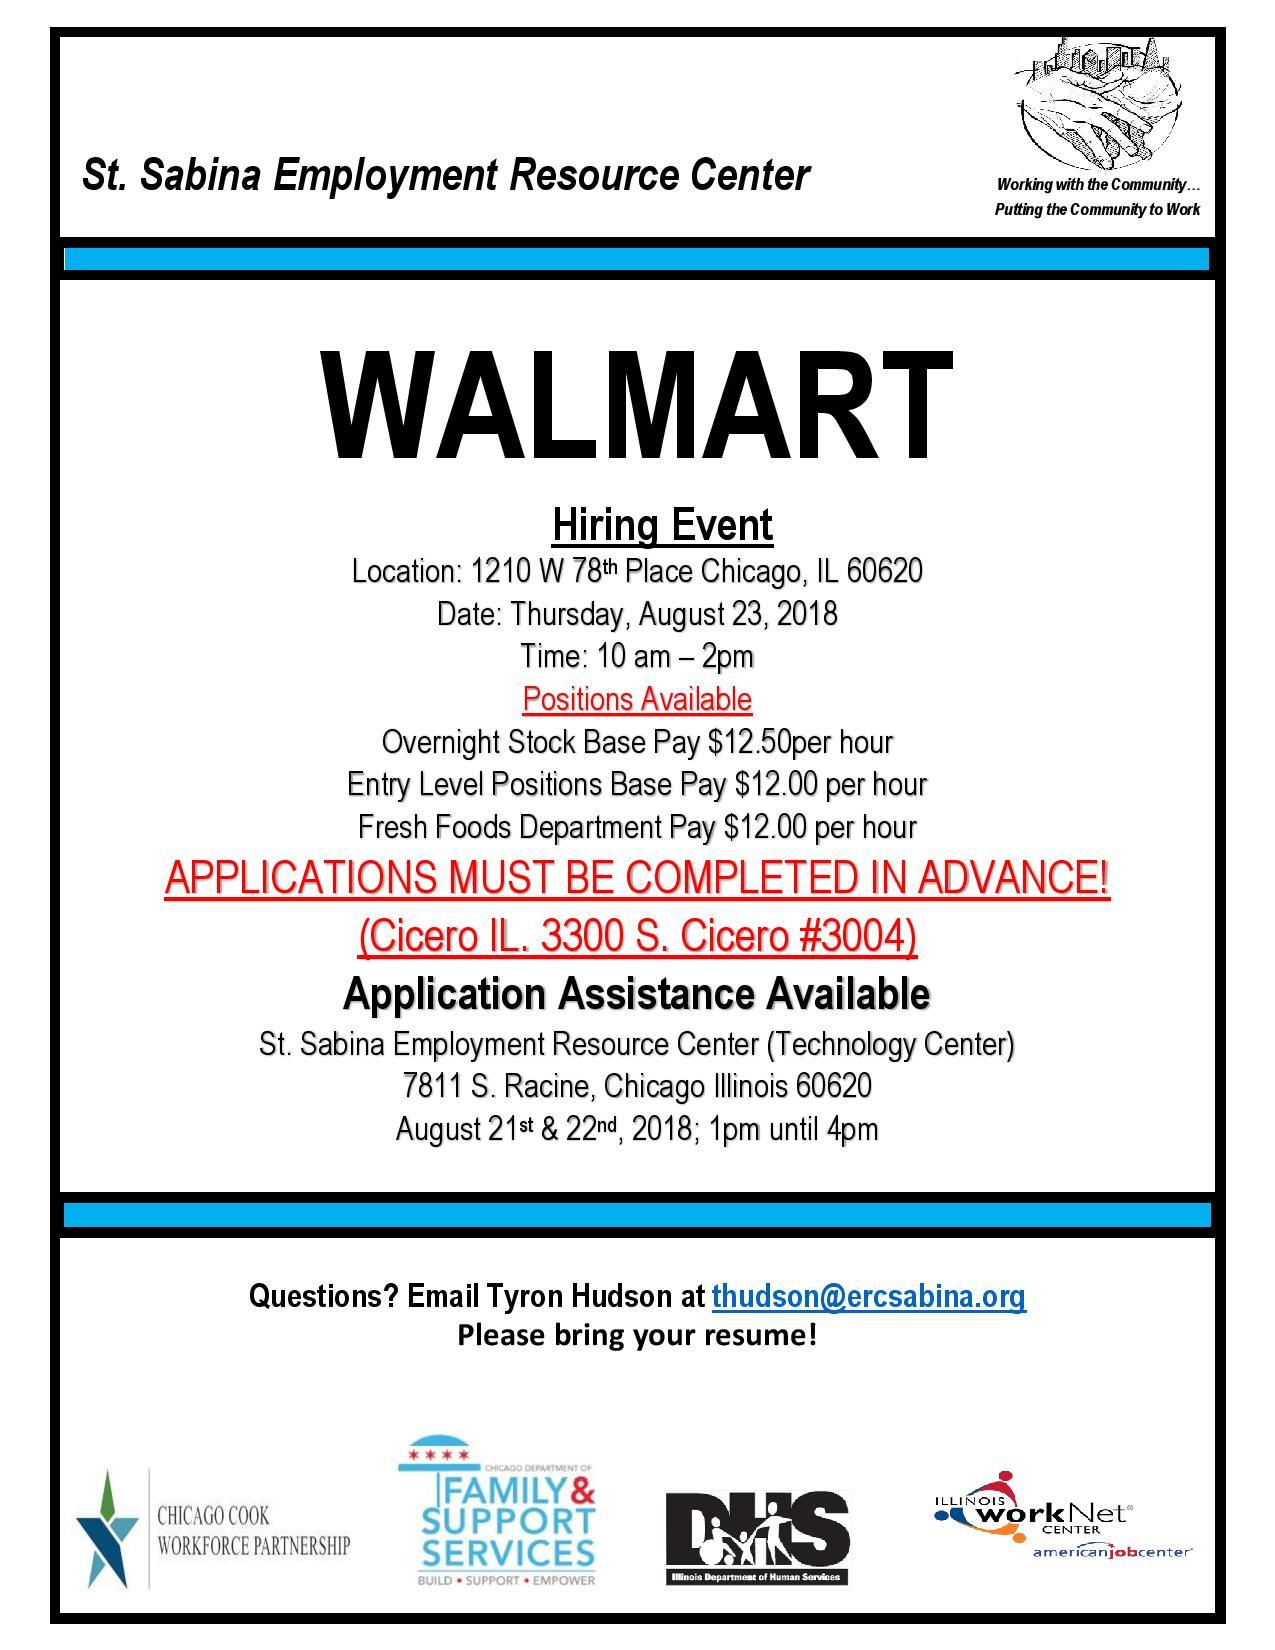 Walmart823-page-001.jpg